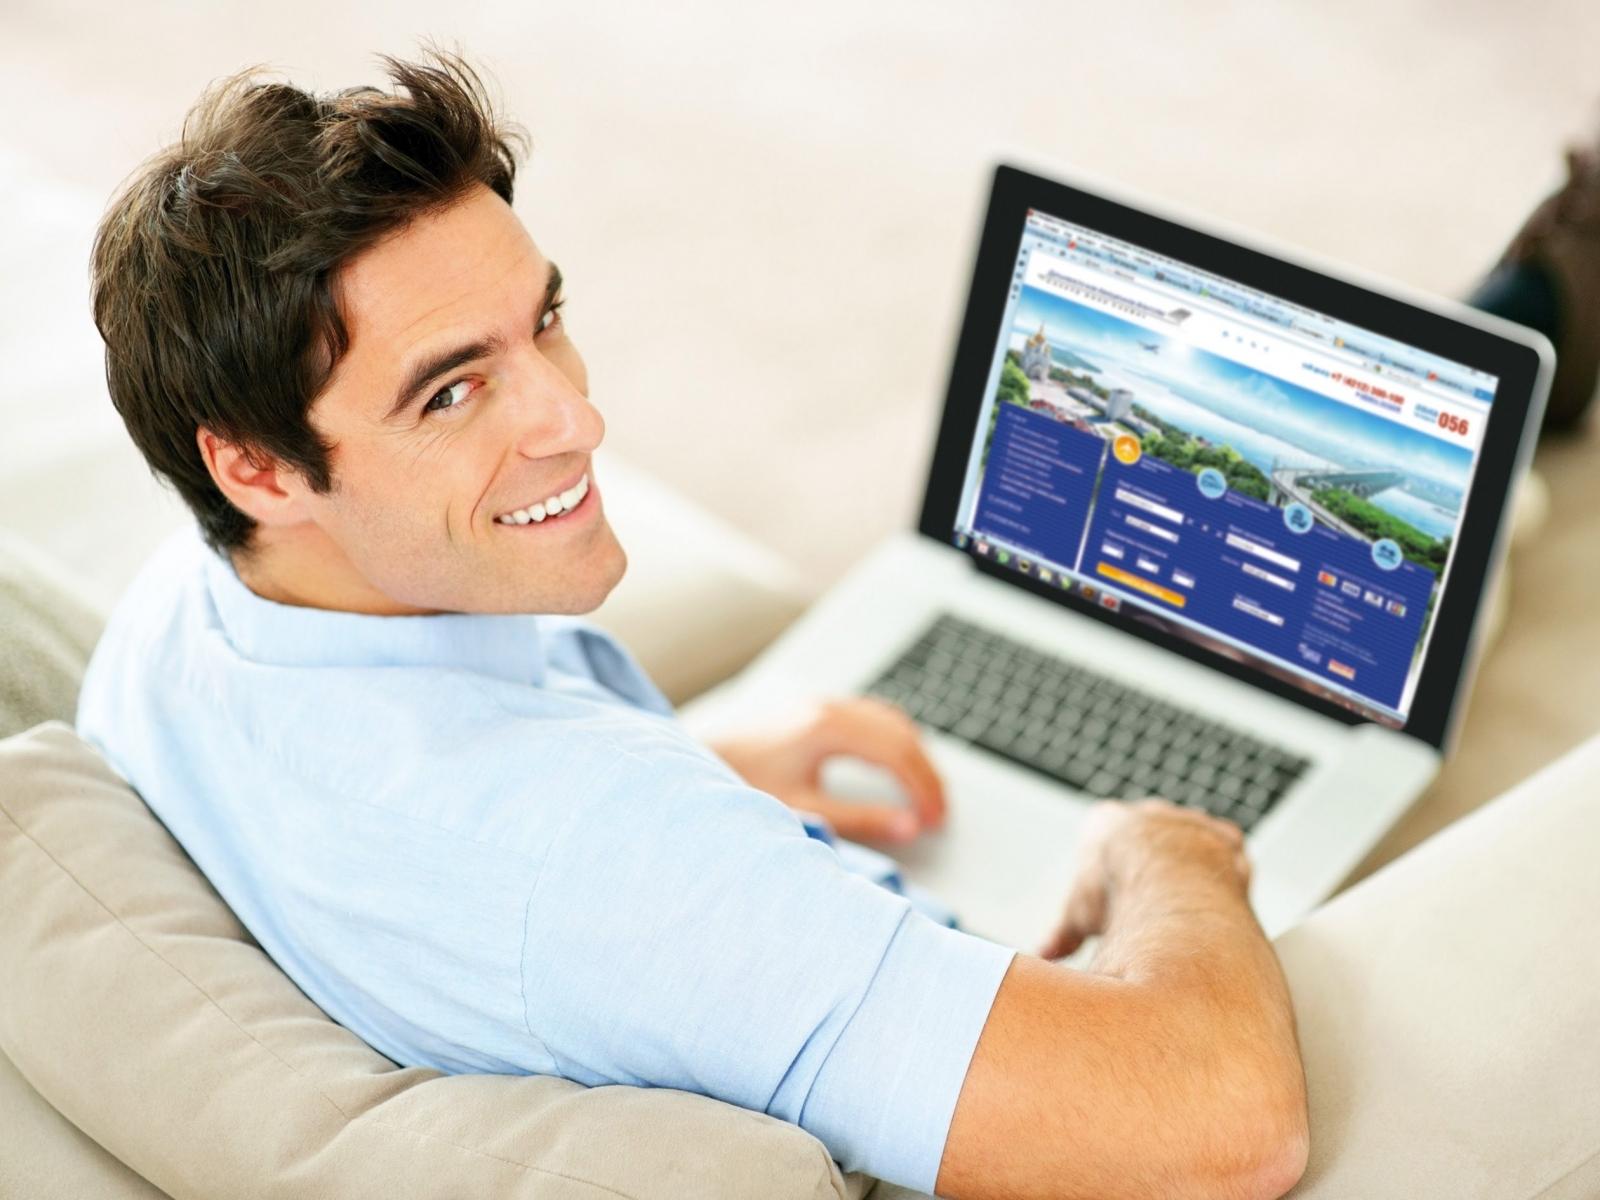 Вебинар по вопросам перехода на онлайн-обучение